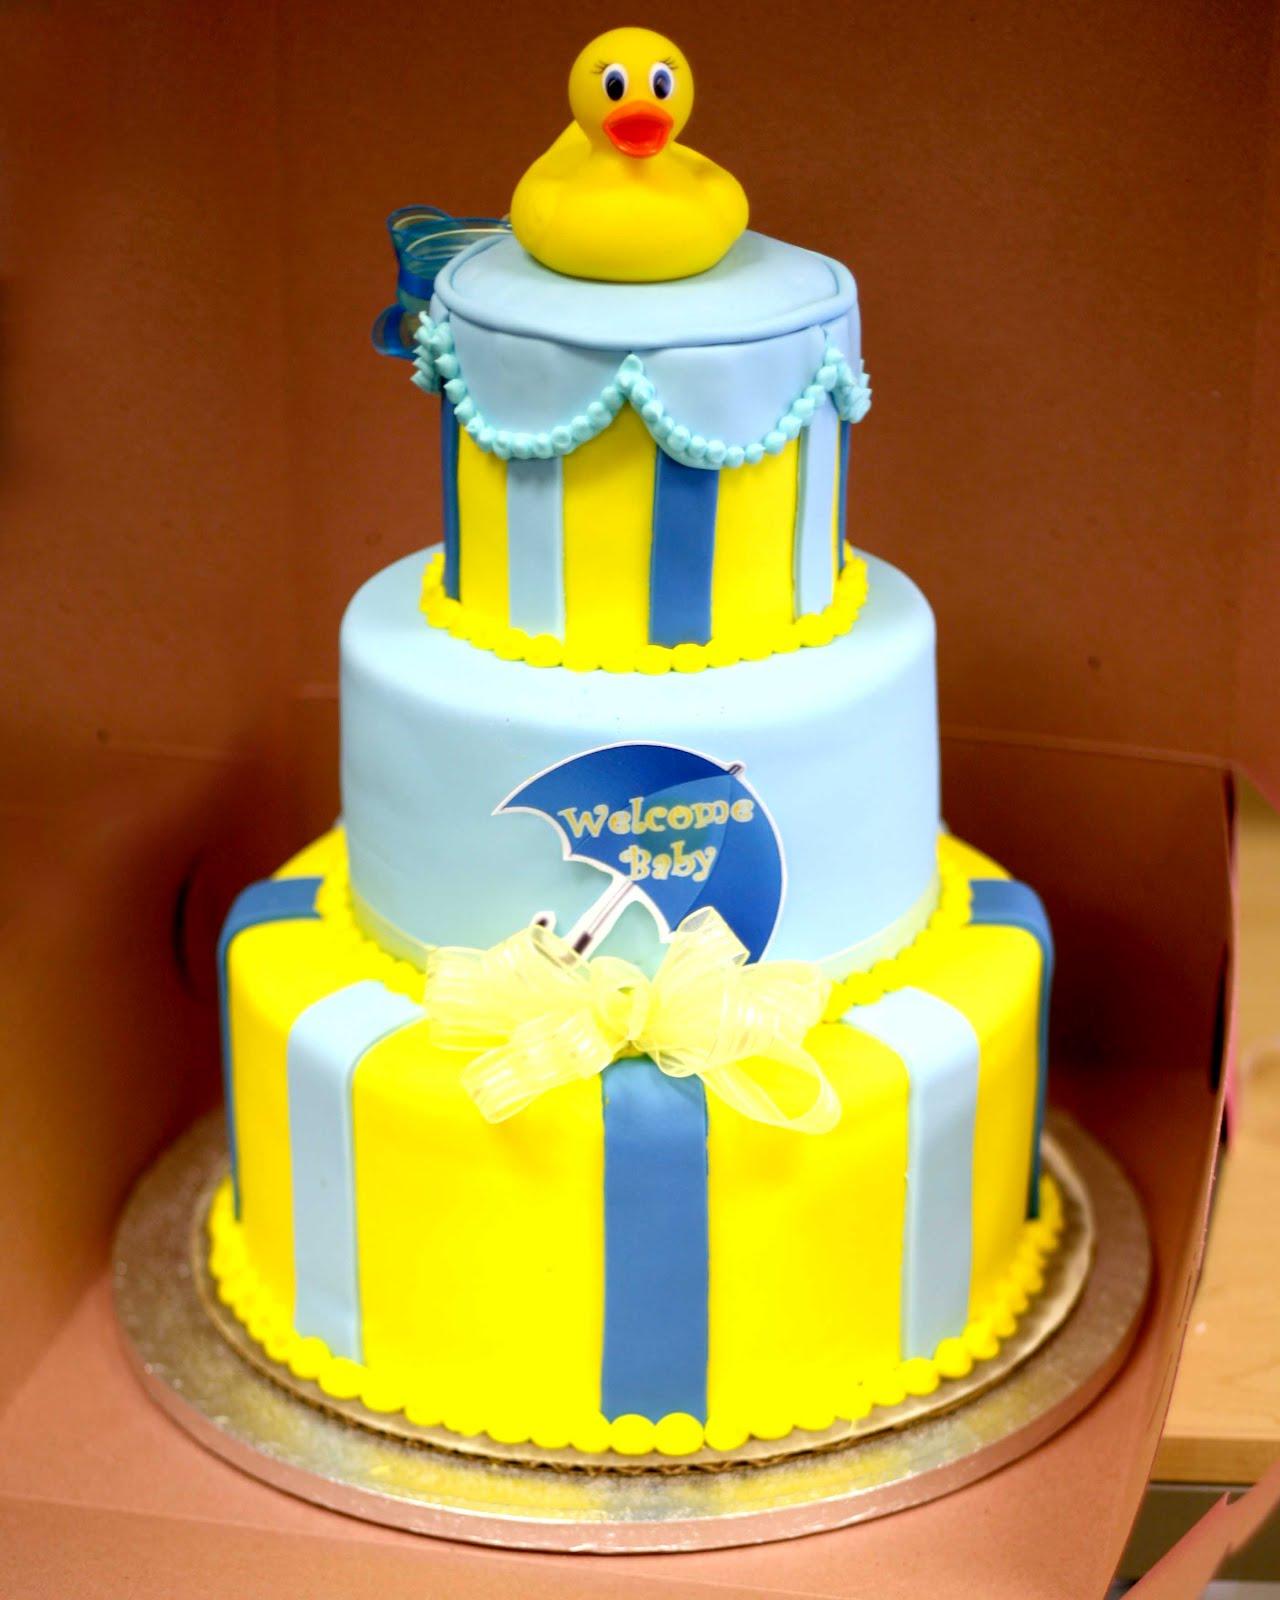 Jungle birthday cakes animal birthday cakes animal cakes 7 cakes cakes - Hector S Custom Cakes Fondant Baby Shower Cake